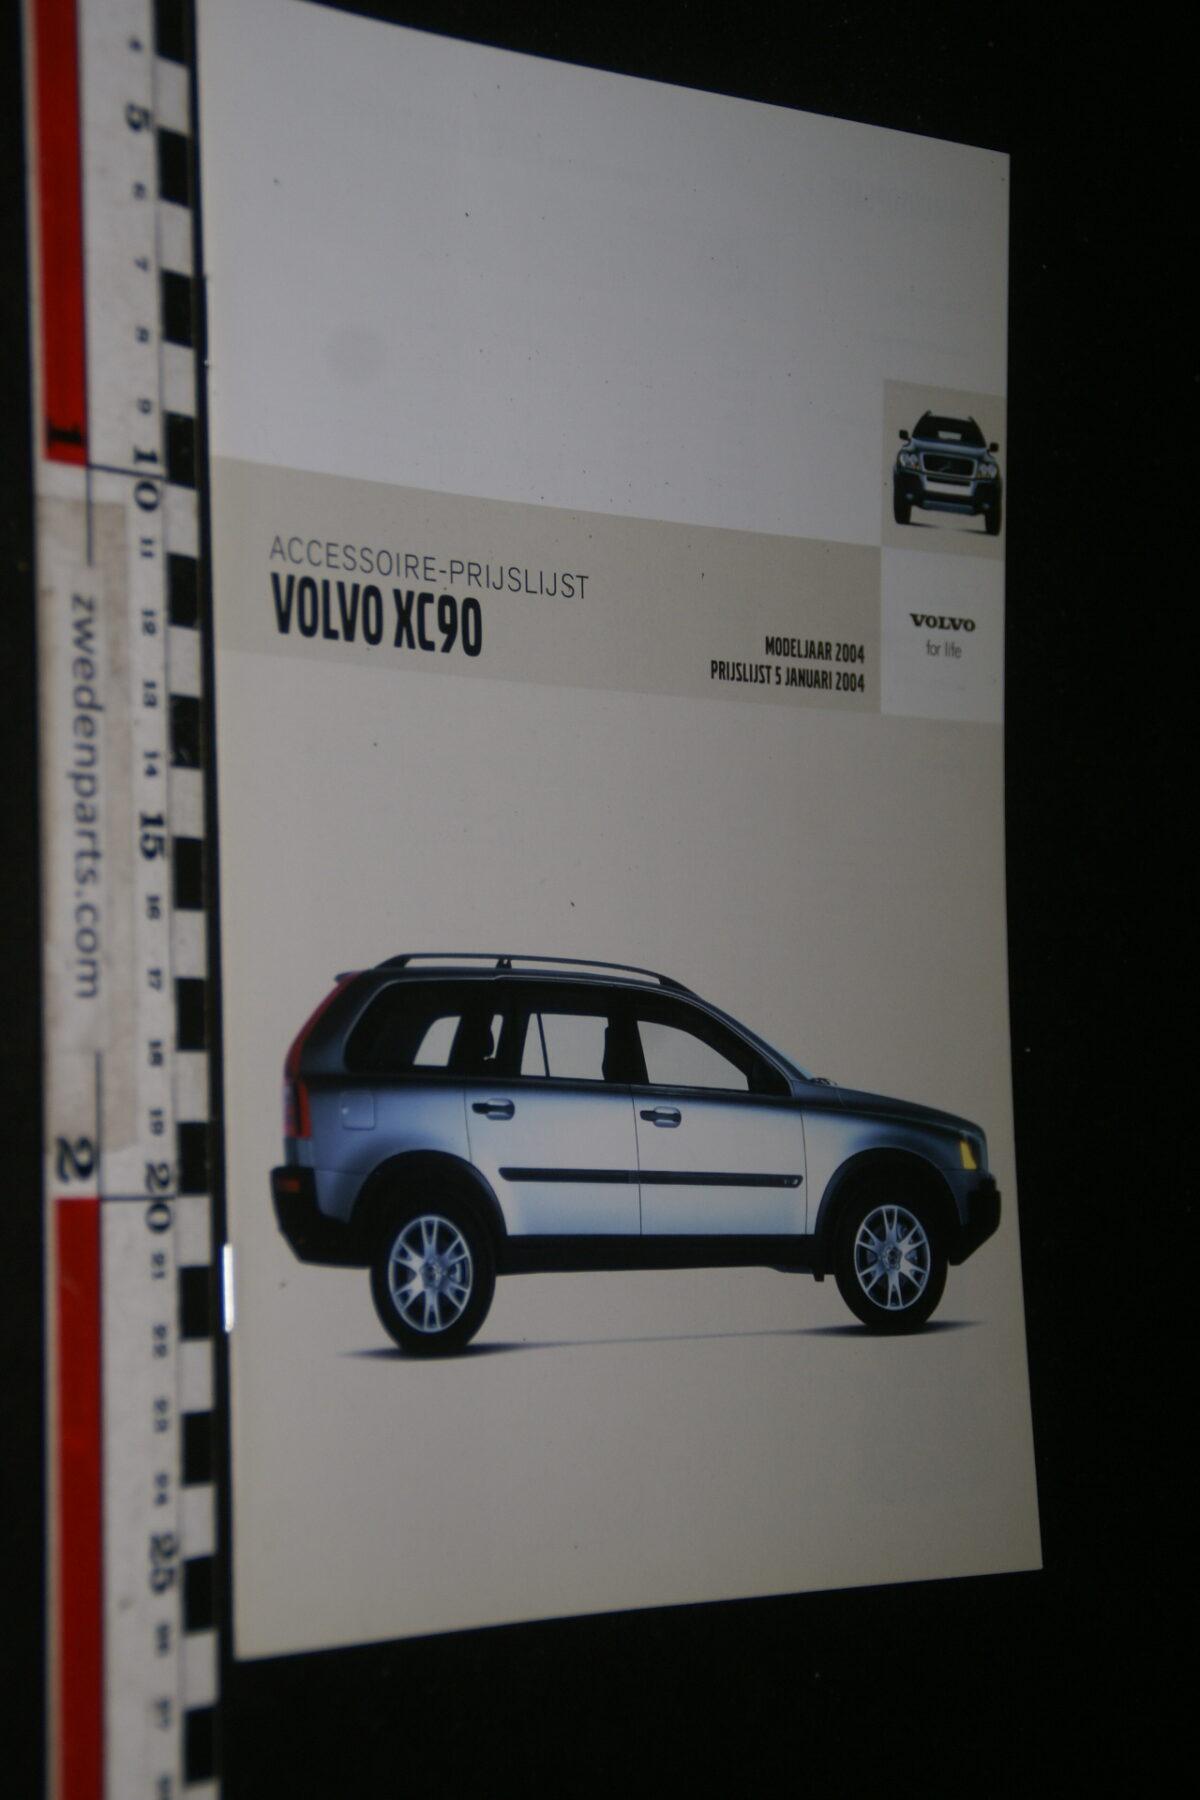 DSC04429 2004 brochure Volvo XC90 nr. MY 040104V1-05191b5a